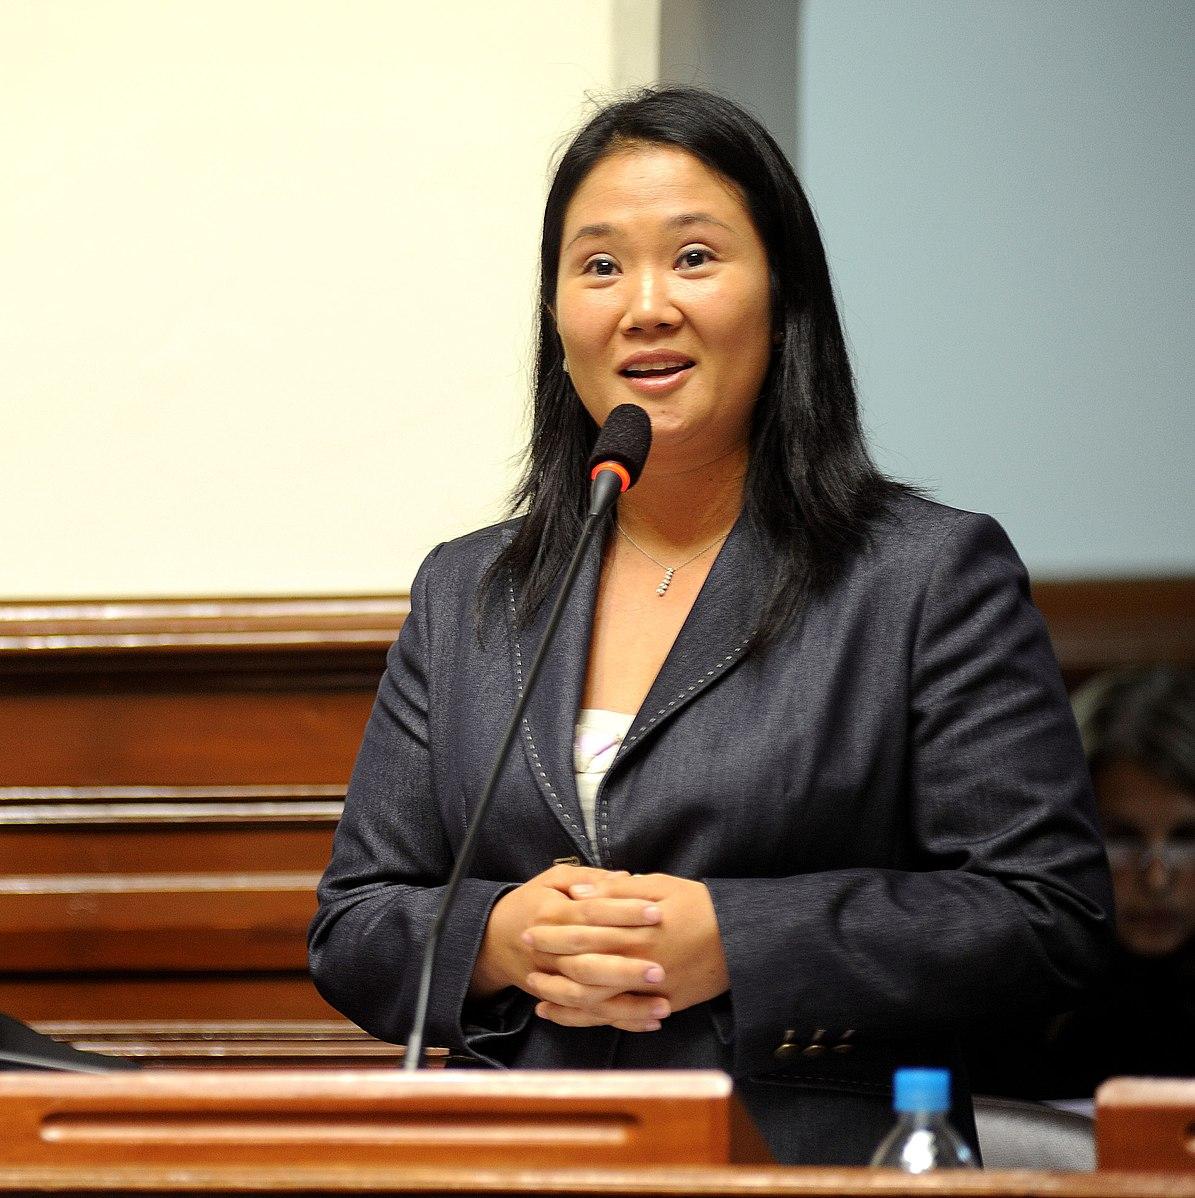 Keiko Fujimori Image Domaine public